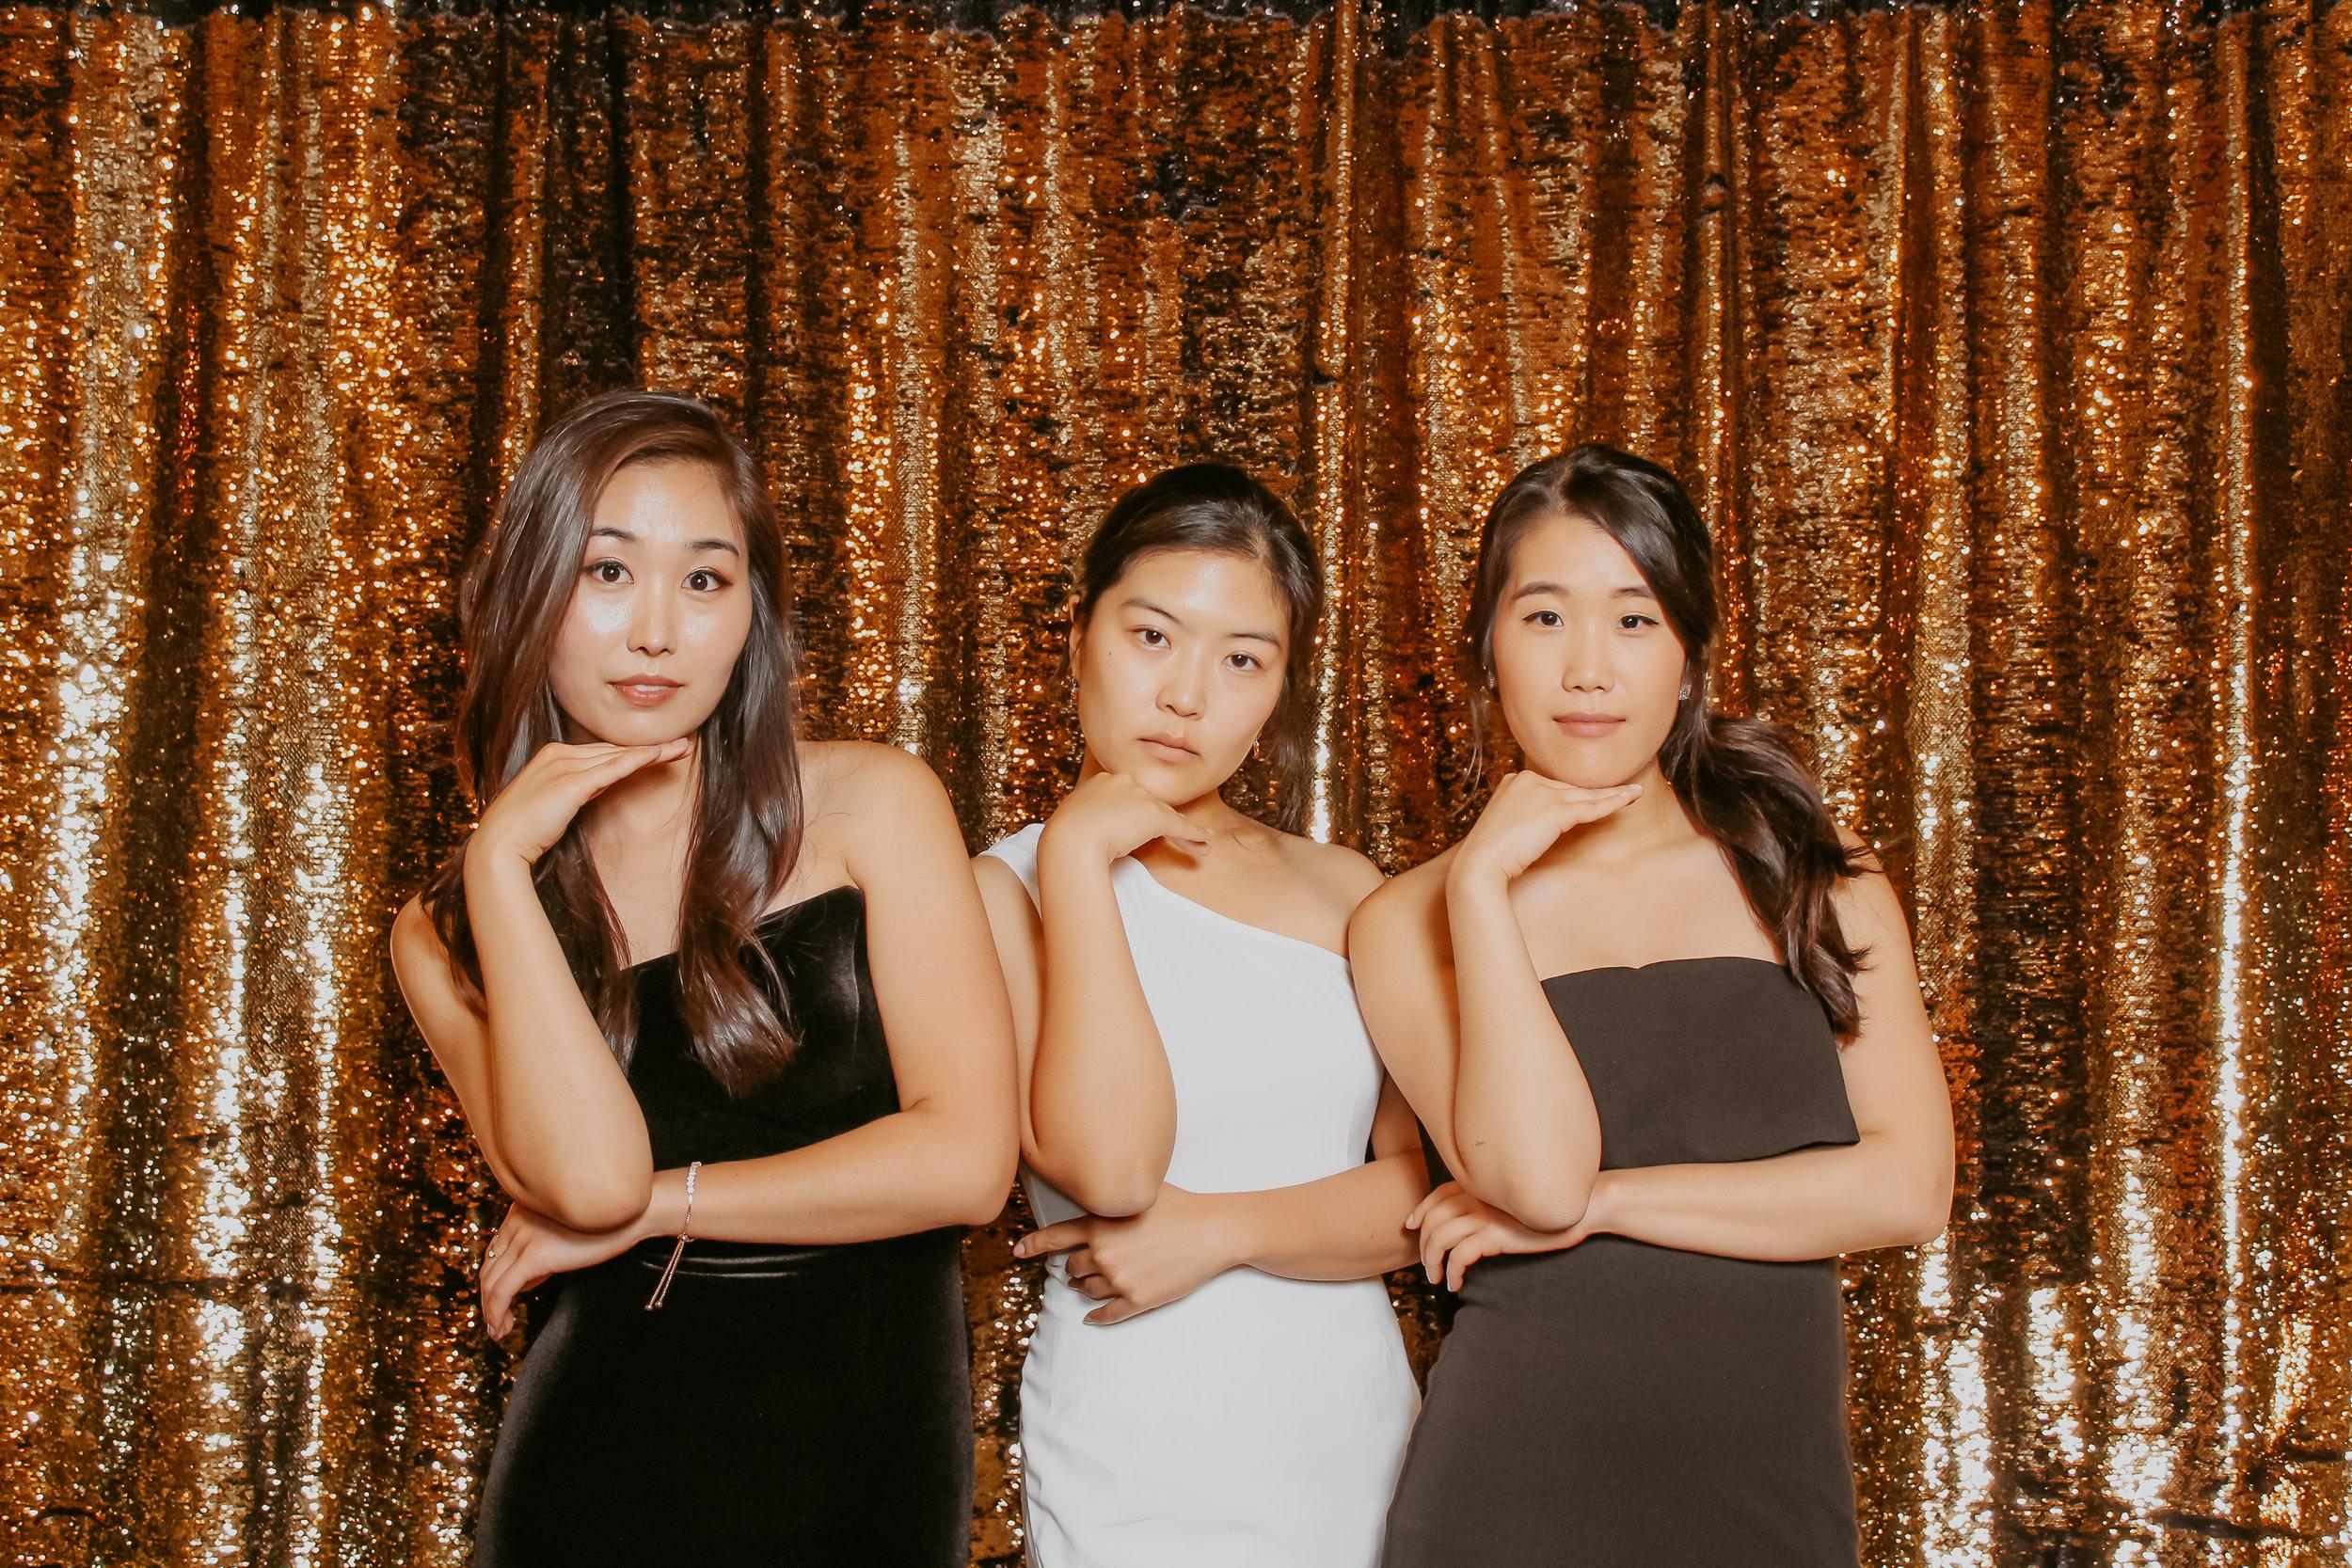 Asian Wedding Photo Booth Rental